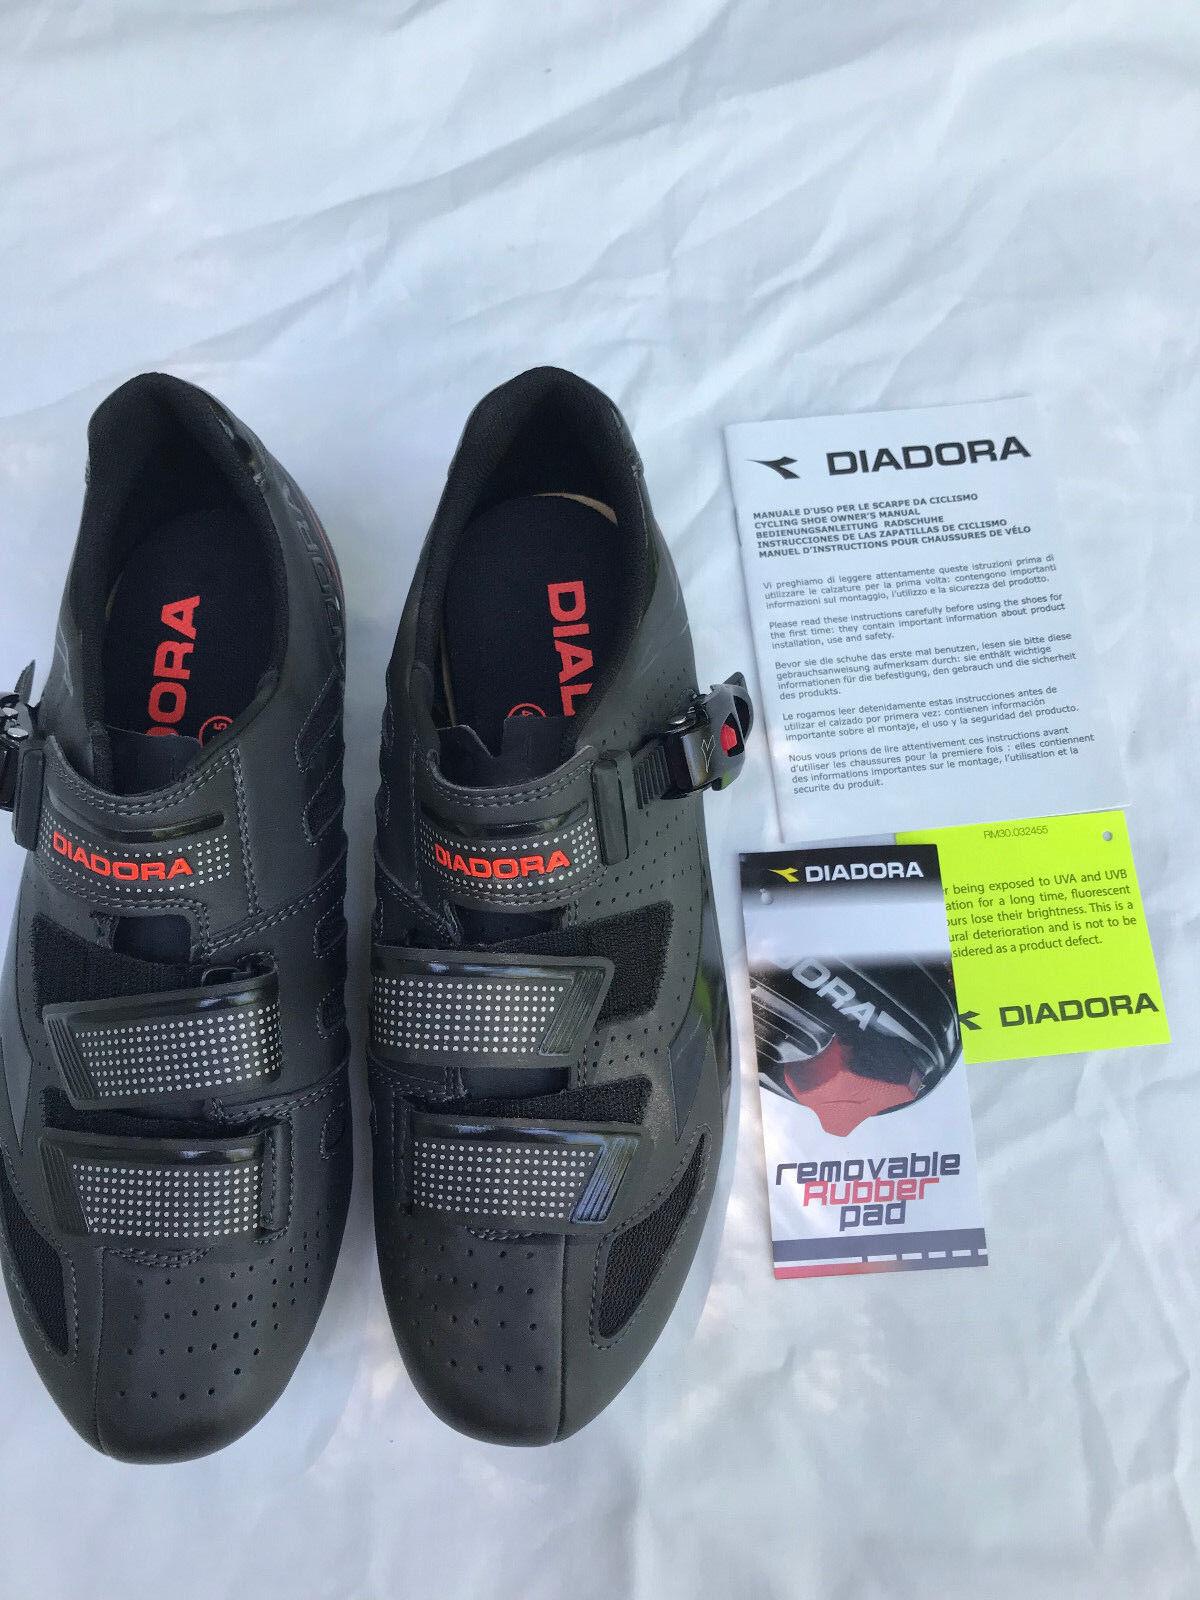 DIADORA Men's TRIVEX PLUS II Bicycle Cycling Shoes Size 41